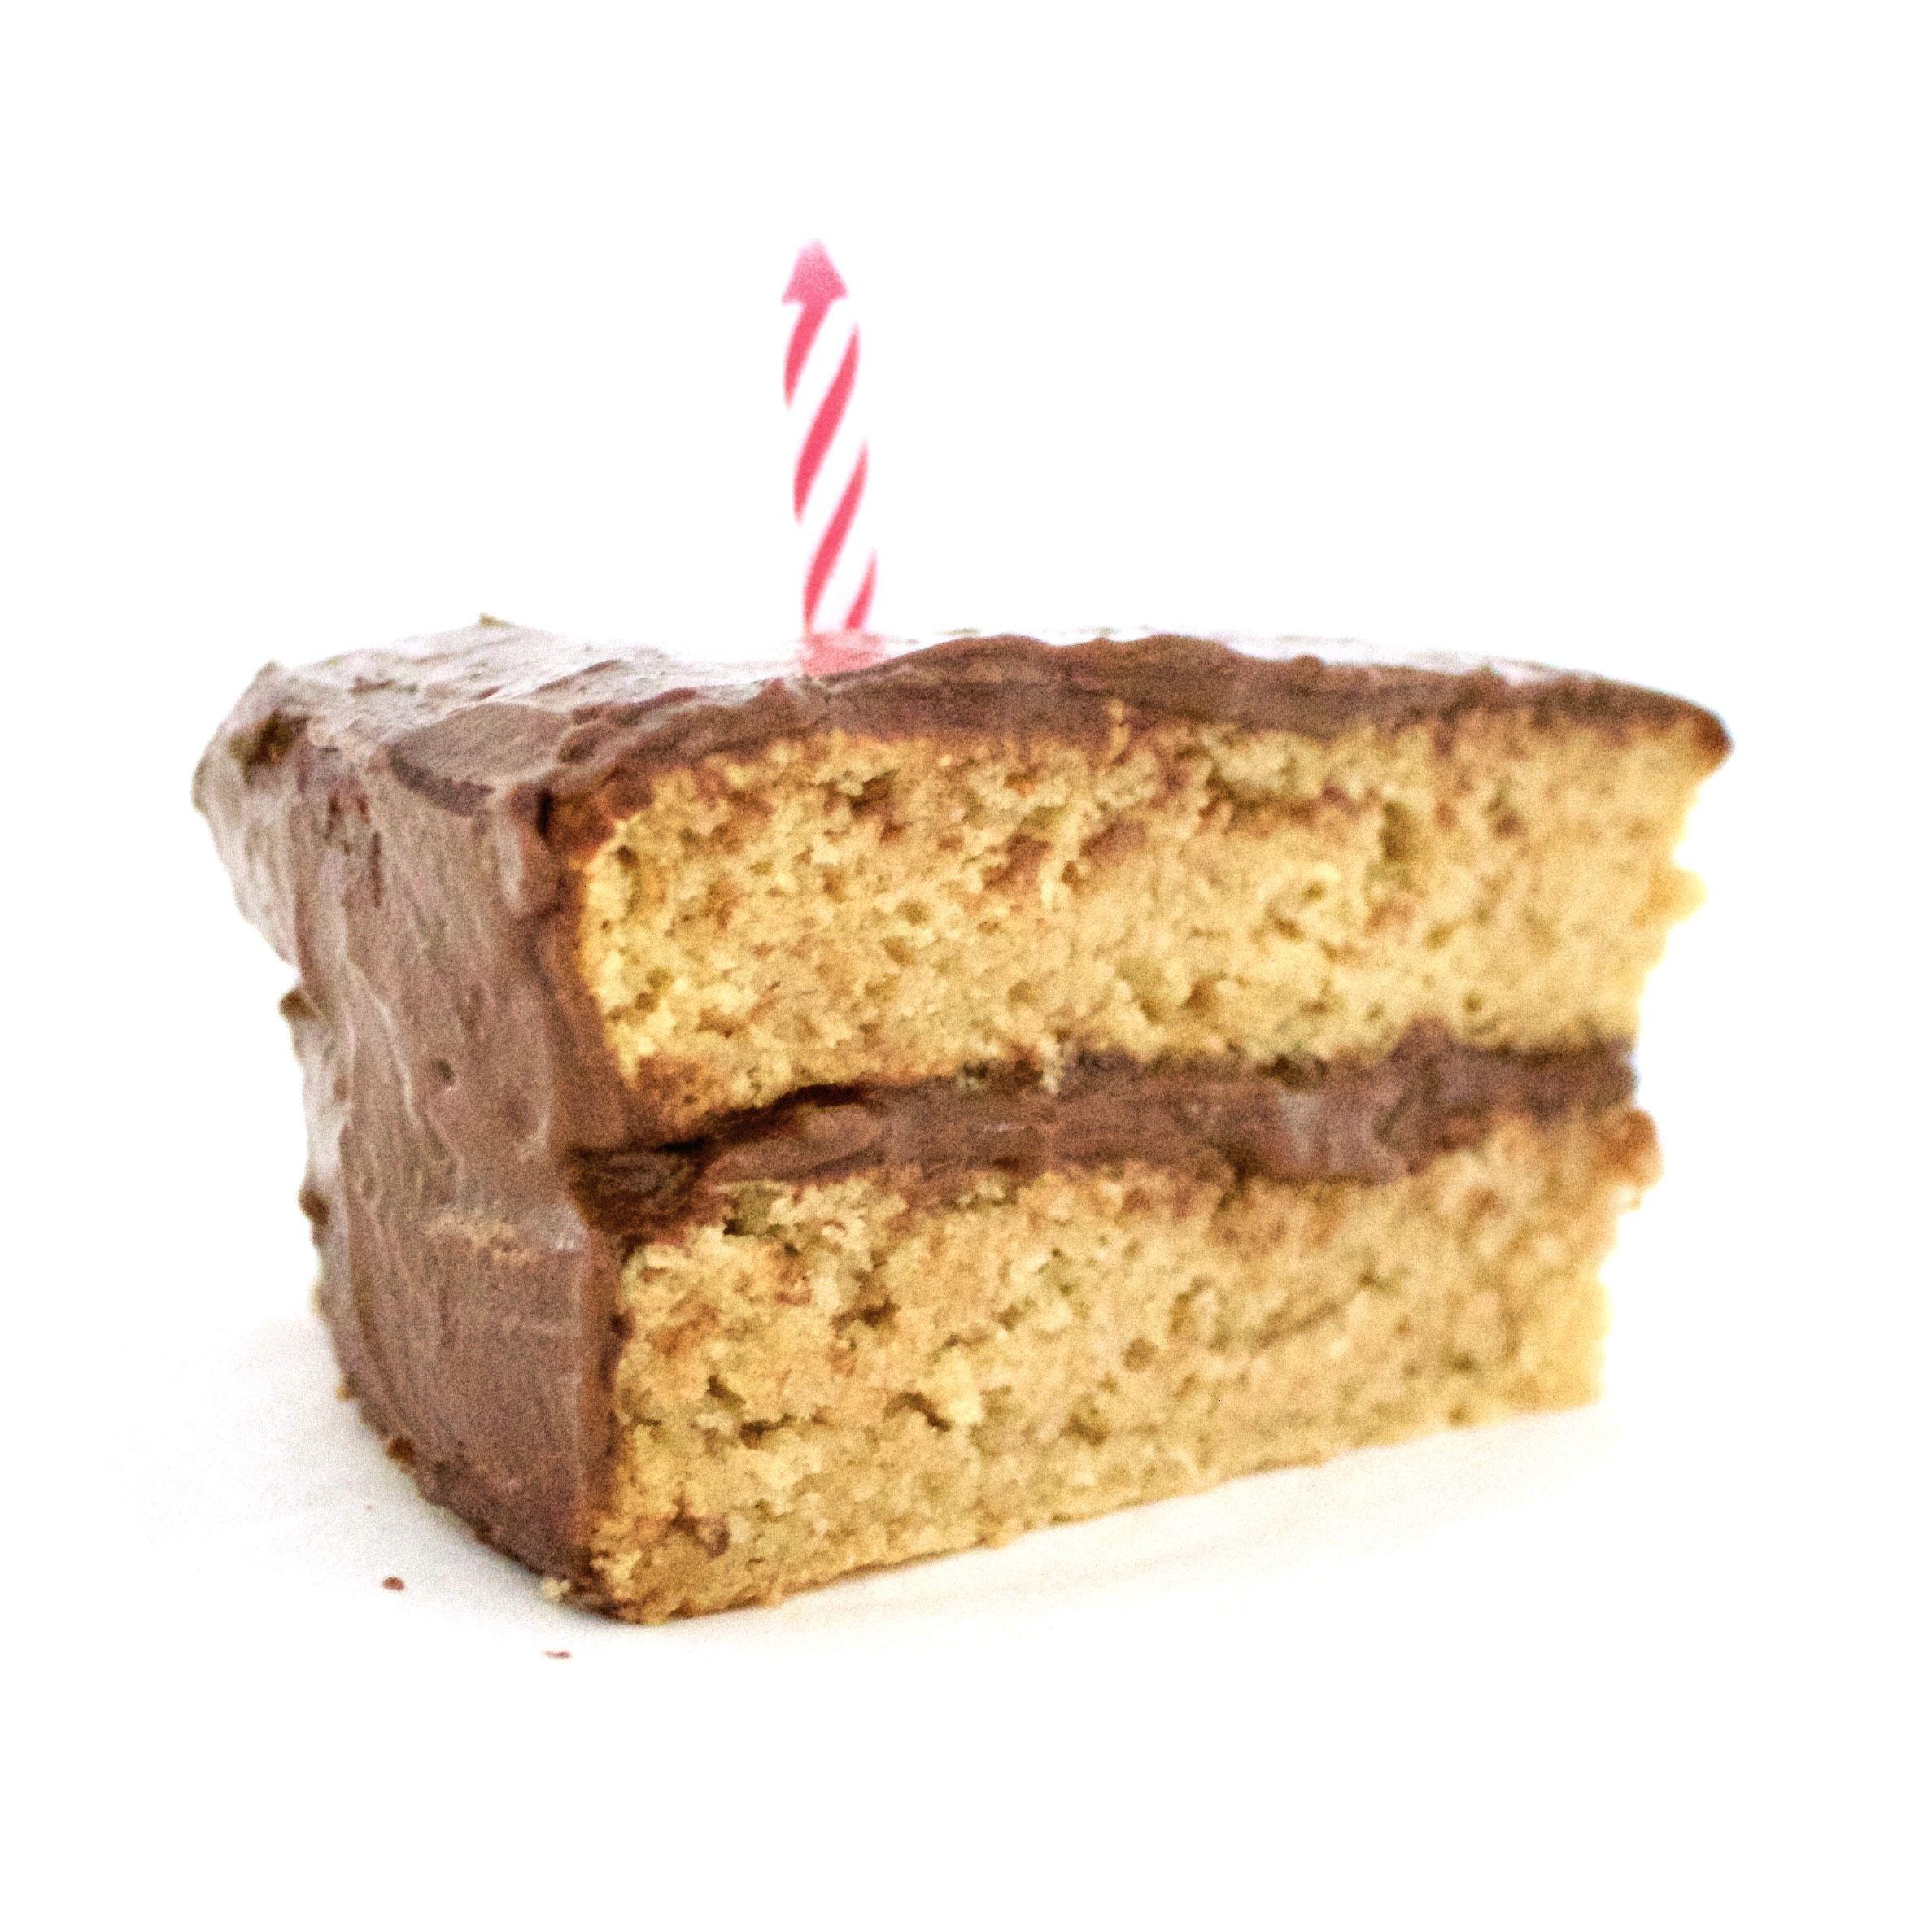 Healthy Vanilla Birthday Cake Butter Extract Zucchini Or Yellow Squash